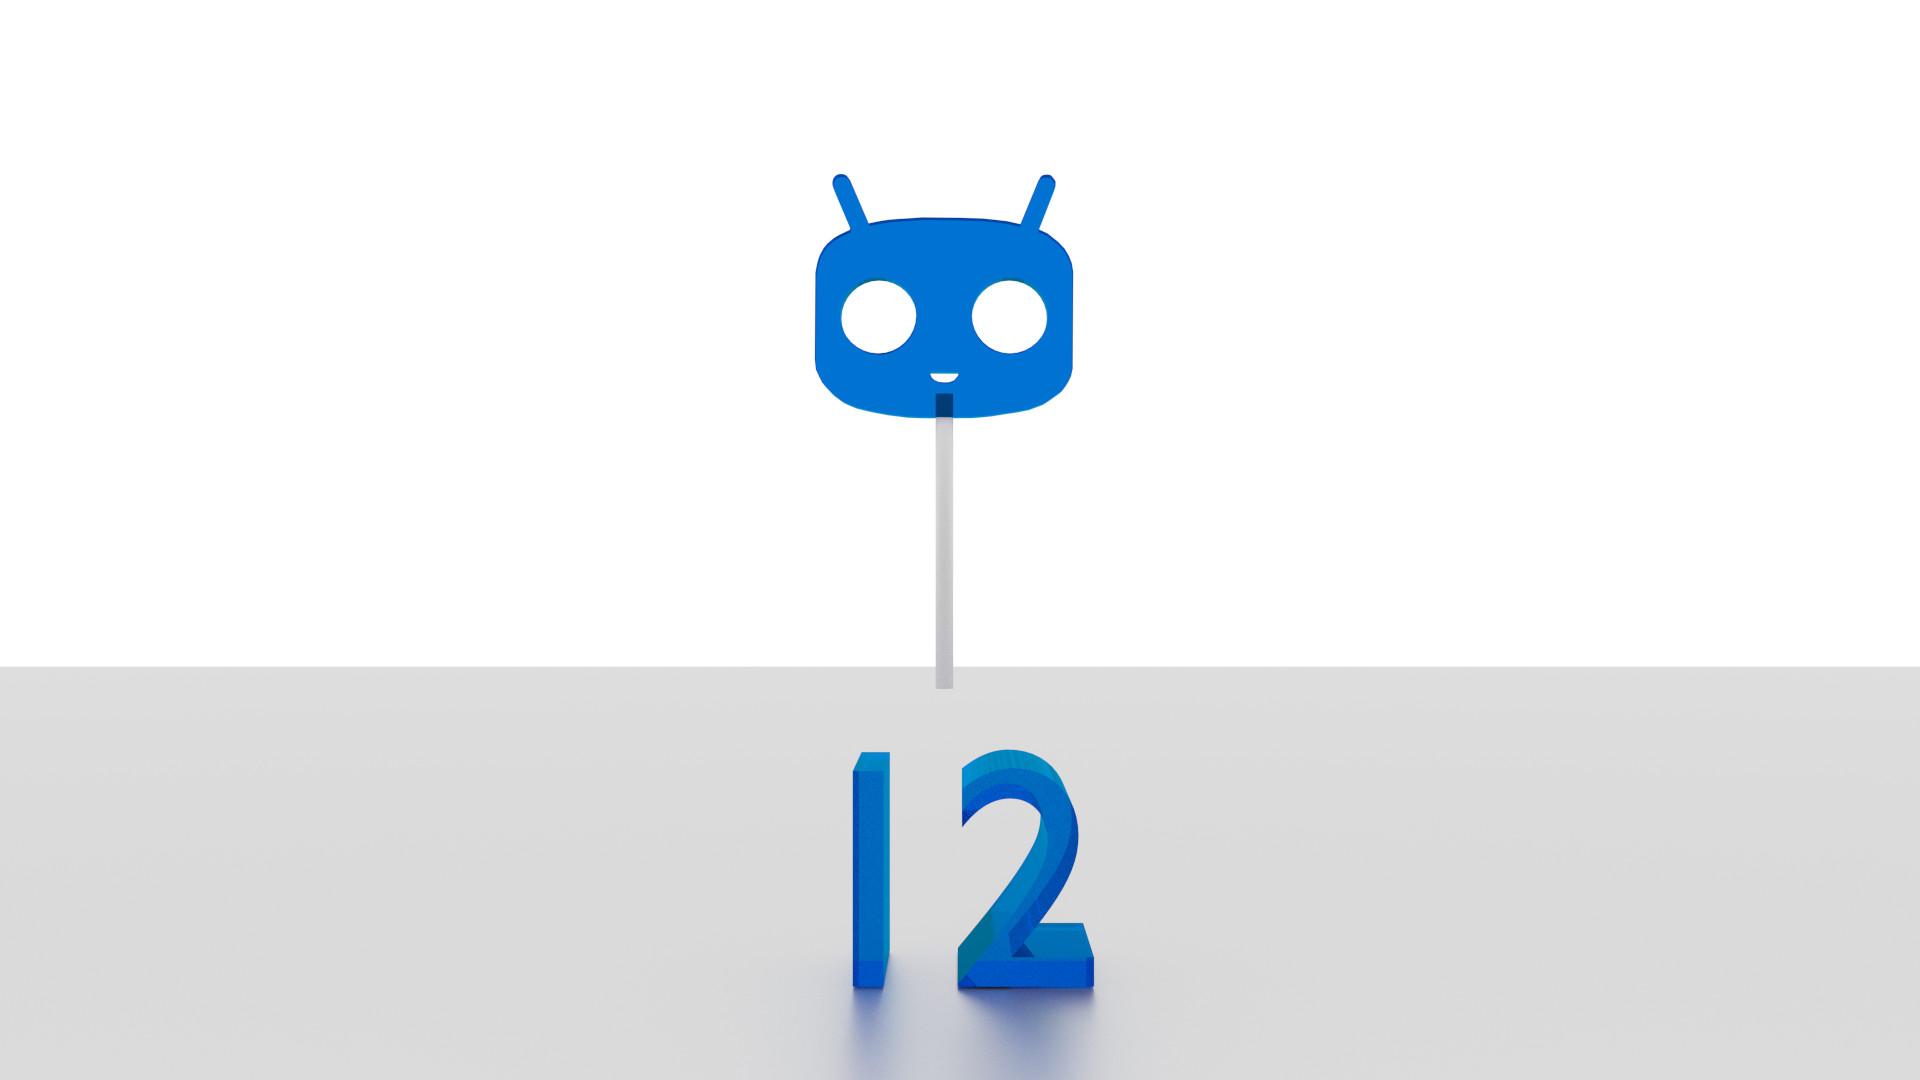 Cyanogenmod Wallpaper (70+ images)